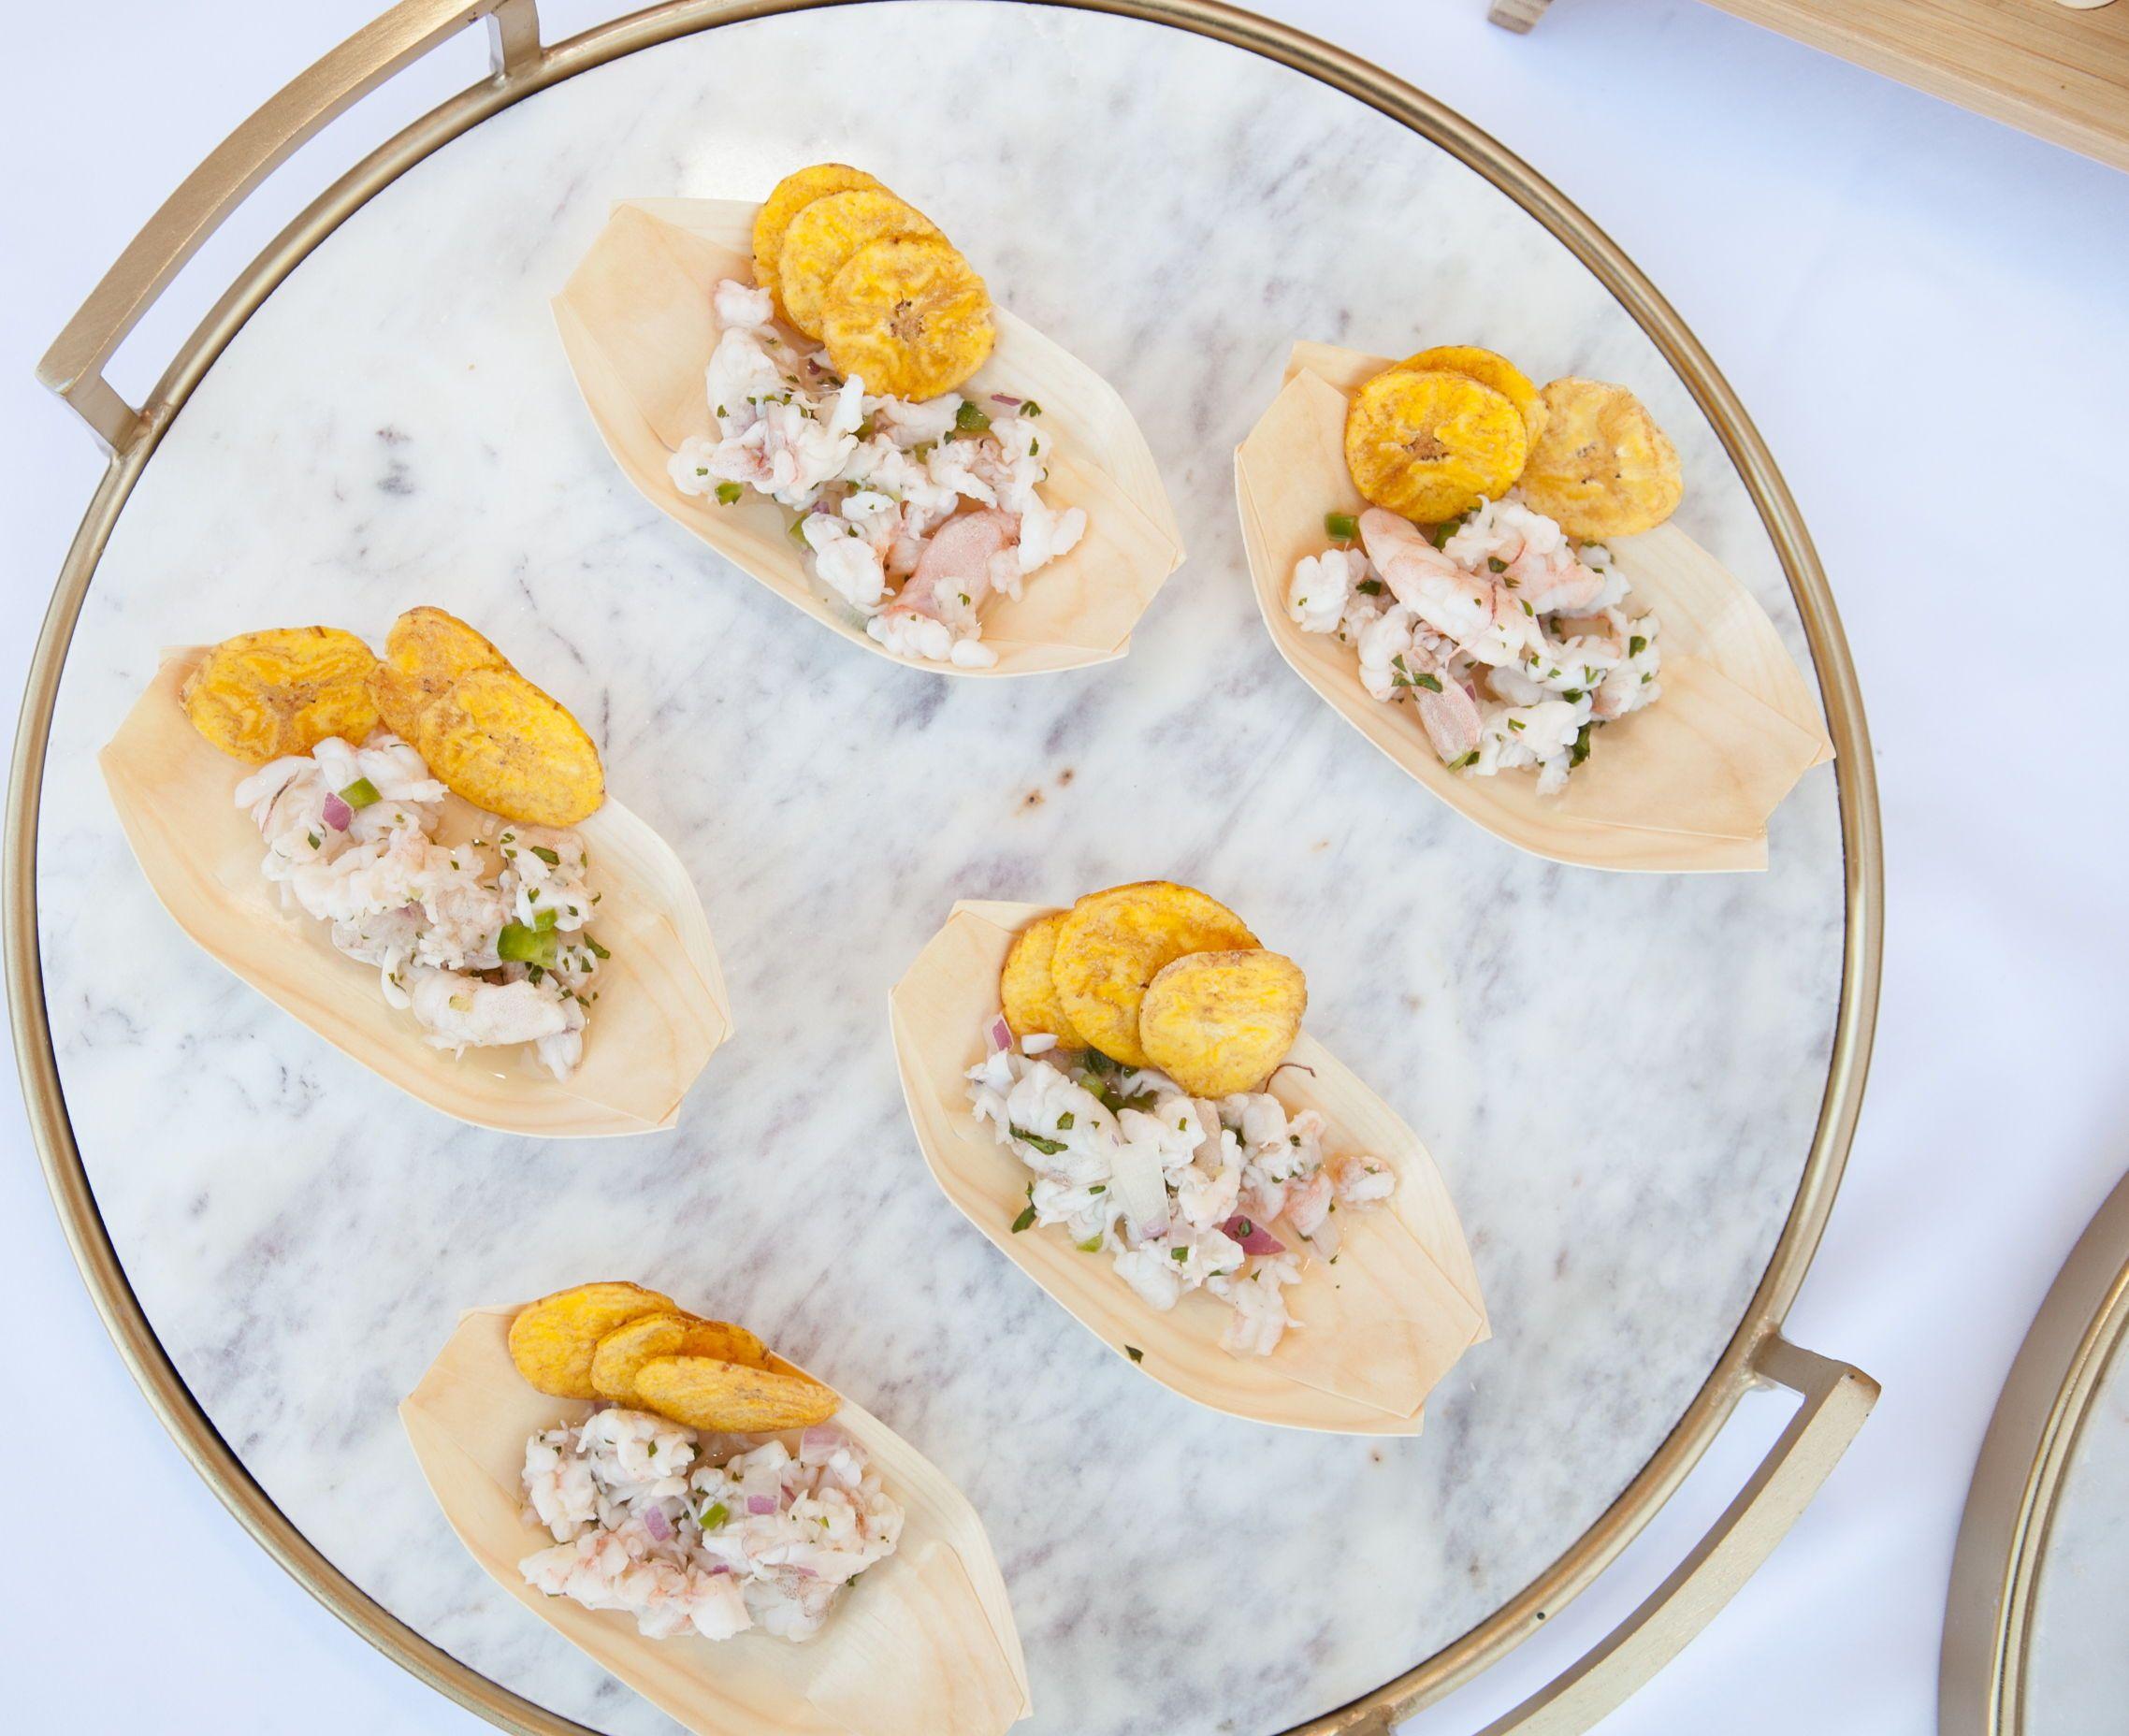 Tampa Catering Tastes Of Tampa Bay Tampa Food Food Photography Wedding Food Ideas Wedding Dishes In 2020 Food Displays Food Truck Catering Food Photography